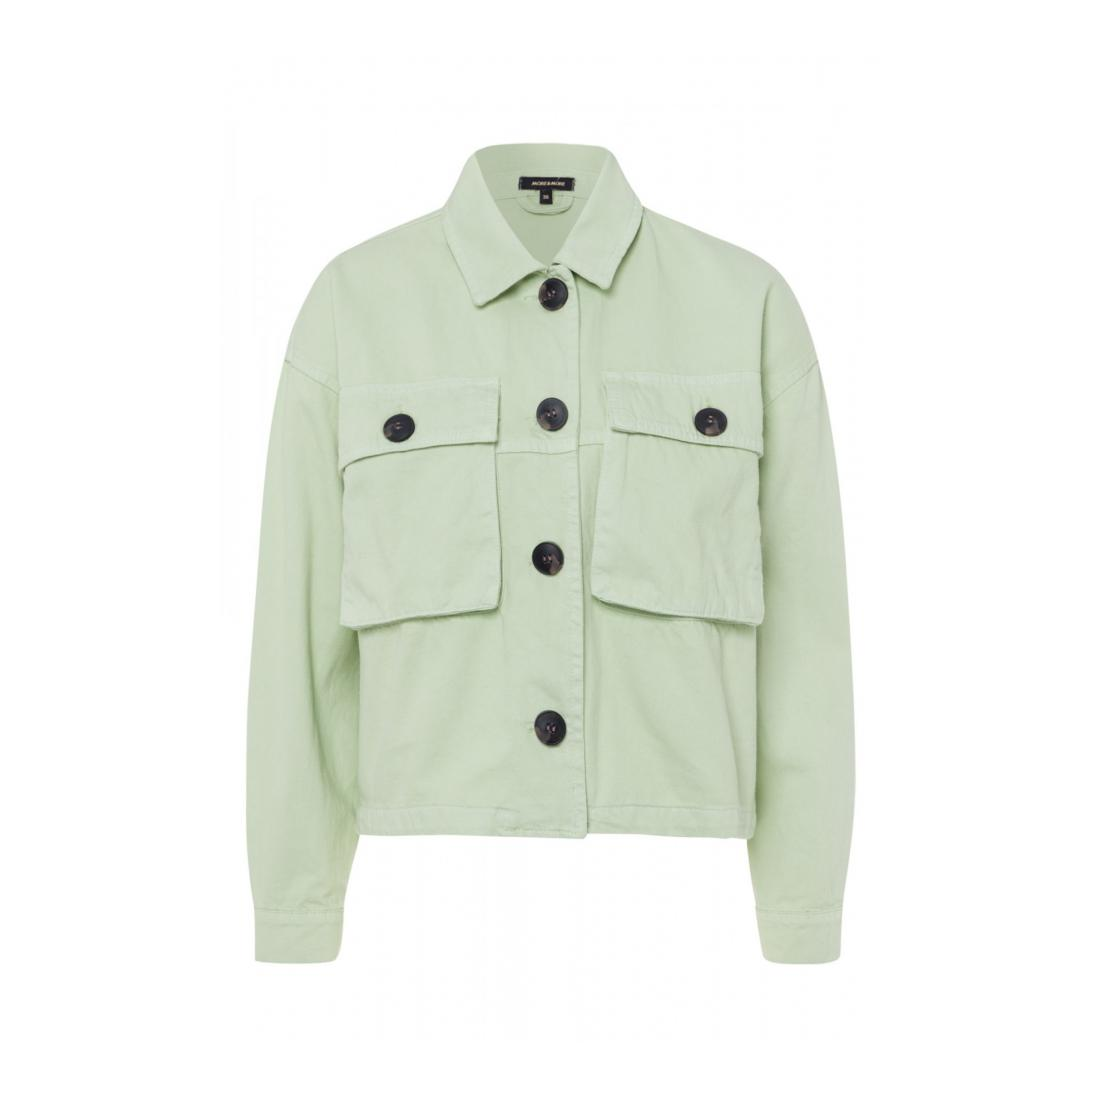 More & More Jacke kurz Damen Casual Cotton Cargo Jacke